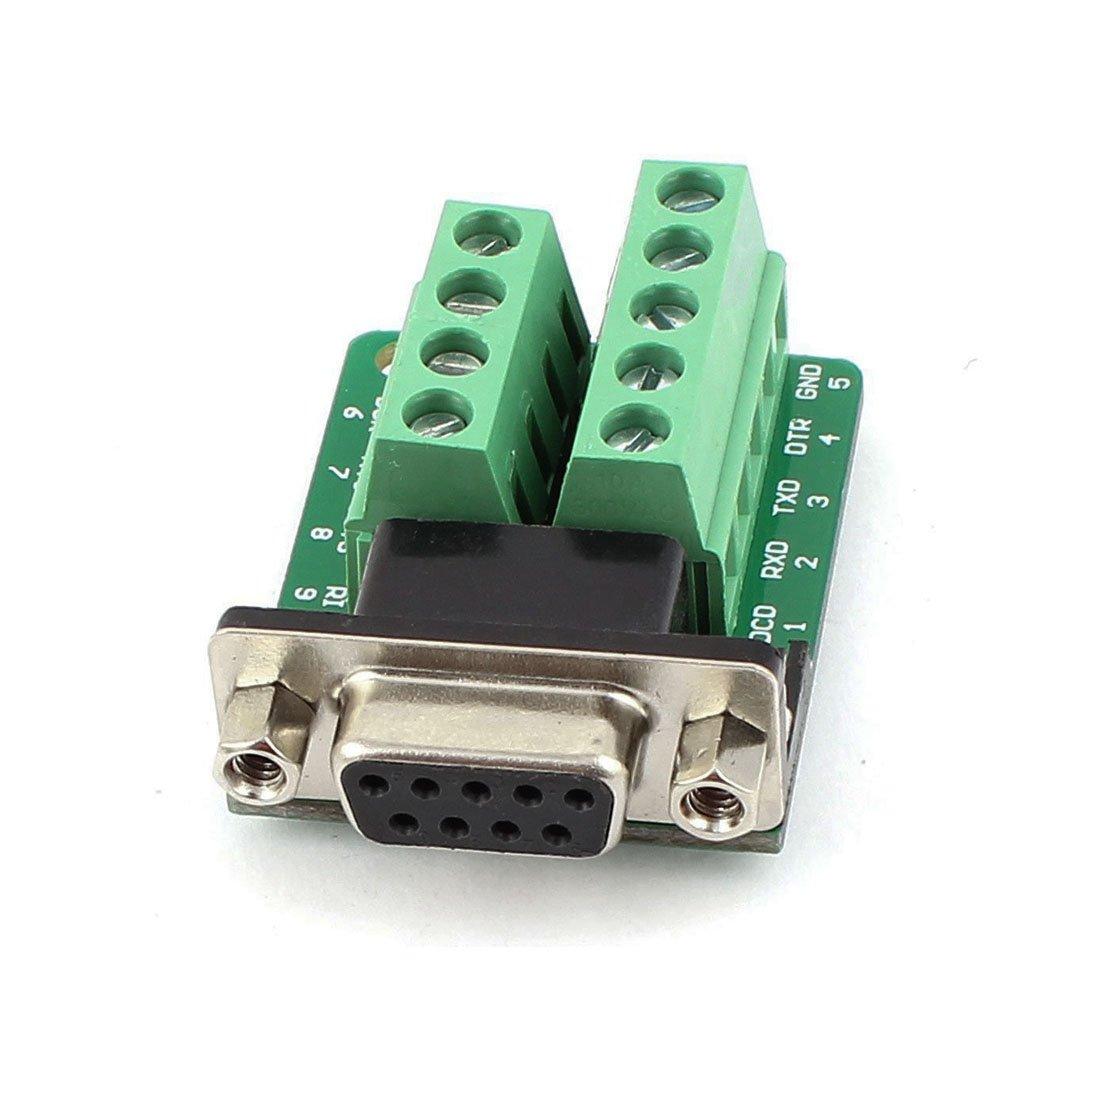 Copapa Connector DB9 RS232 D-SUB Female Plug 9-pin Port Adapter to Terminal Connector Signal Module DB9-M